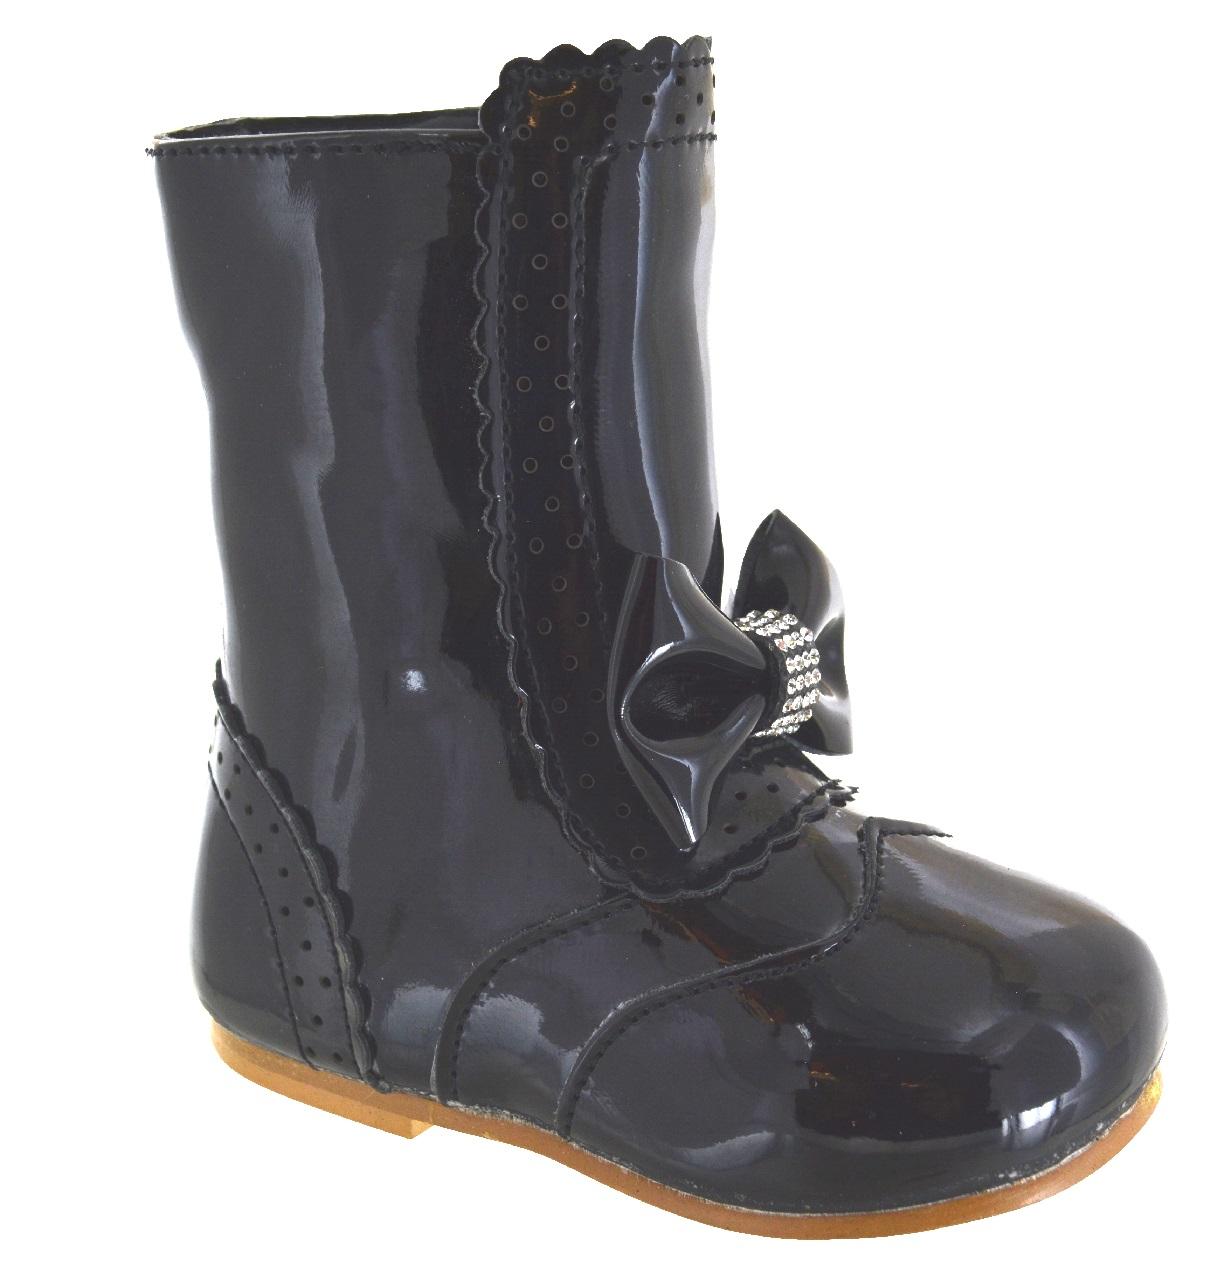 Enfants-Filles-Bebe-Nourrissons-N-ud-Strass-Cheville-Fermeture-Eclair-Chaussures-Soiree-Mariage